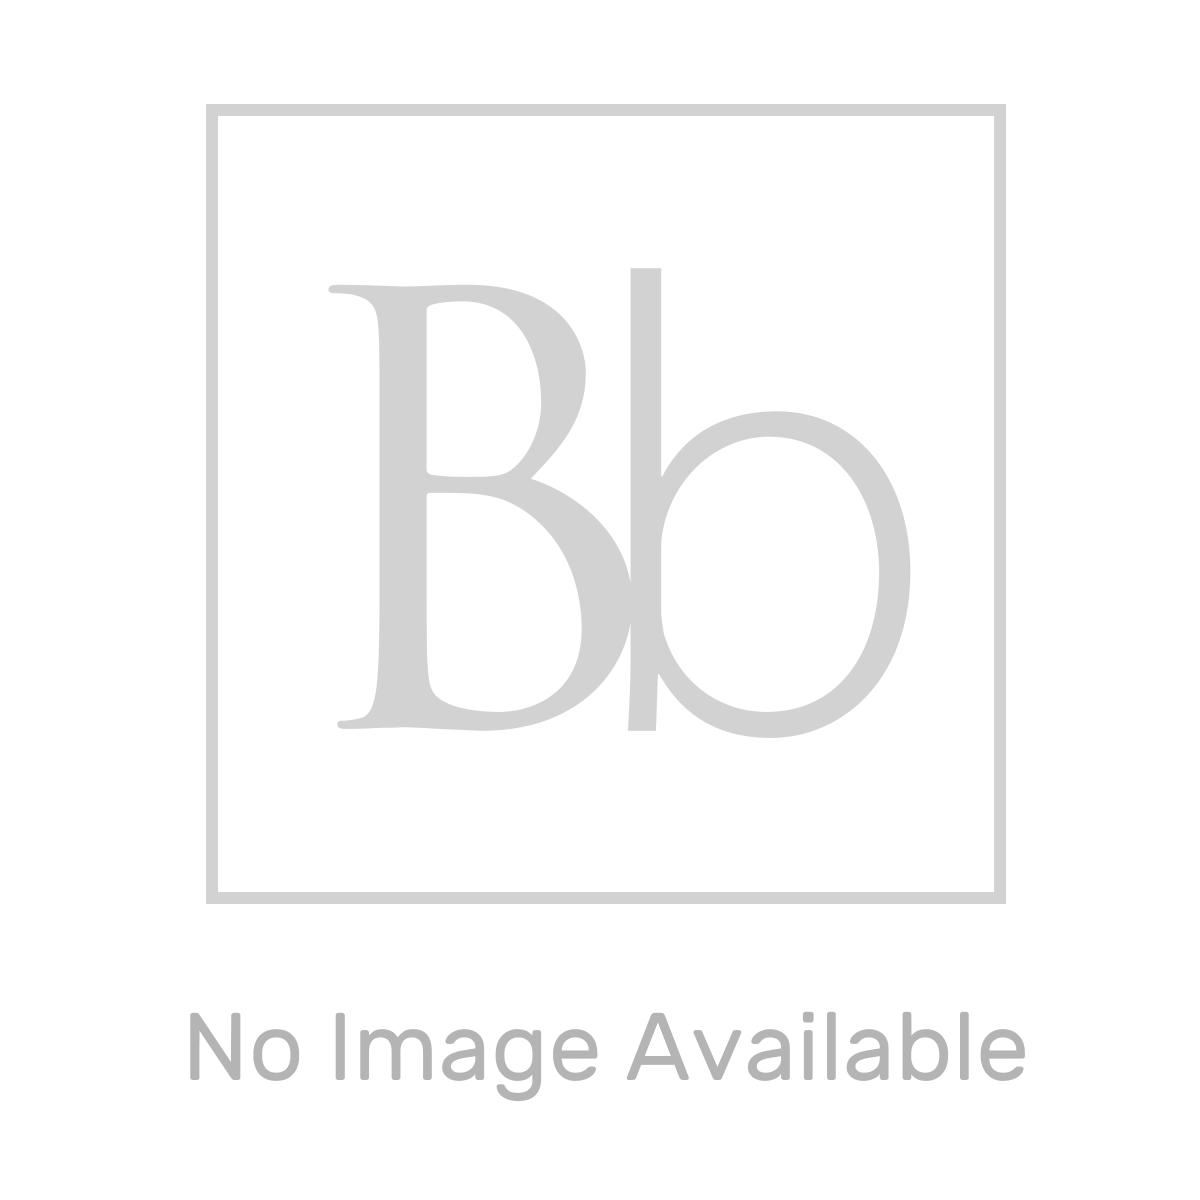 Aquadart White Slate Shower Tray 1600 x 700 Overhead